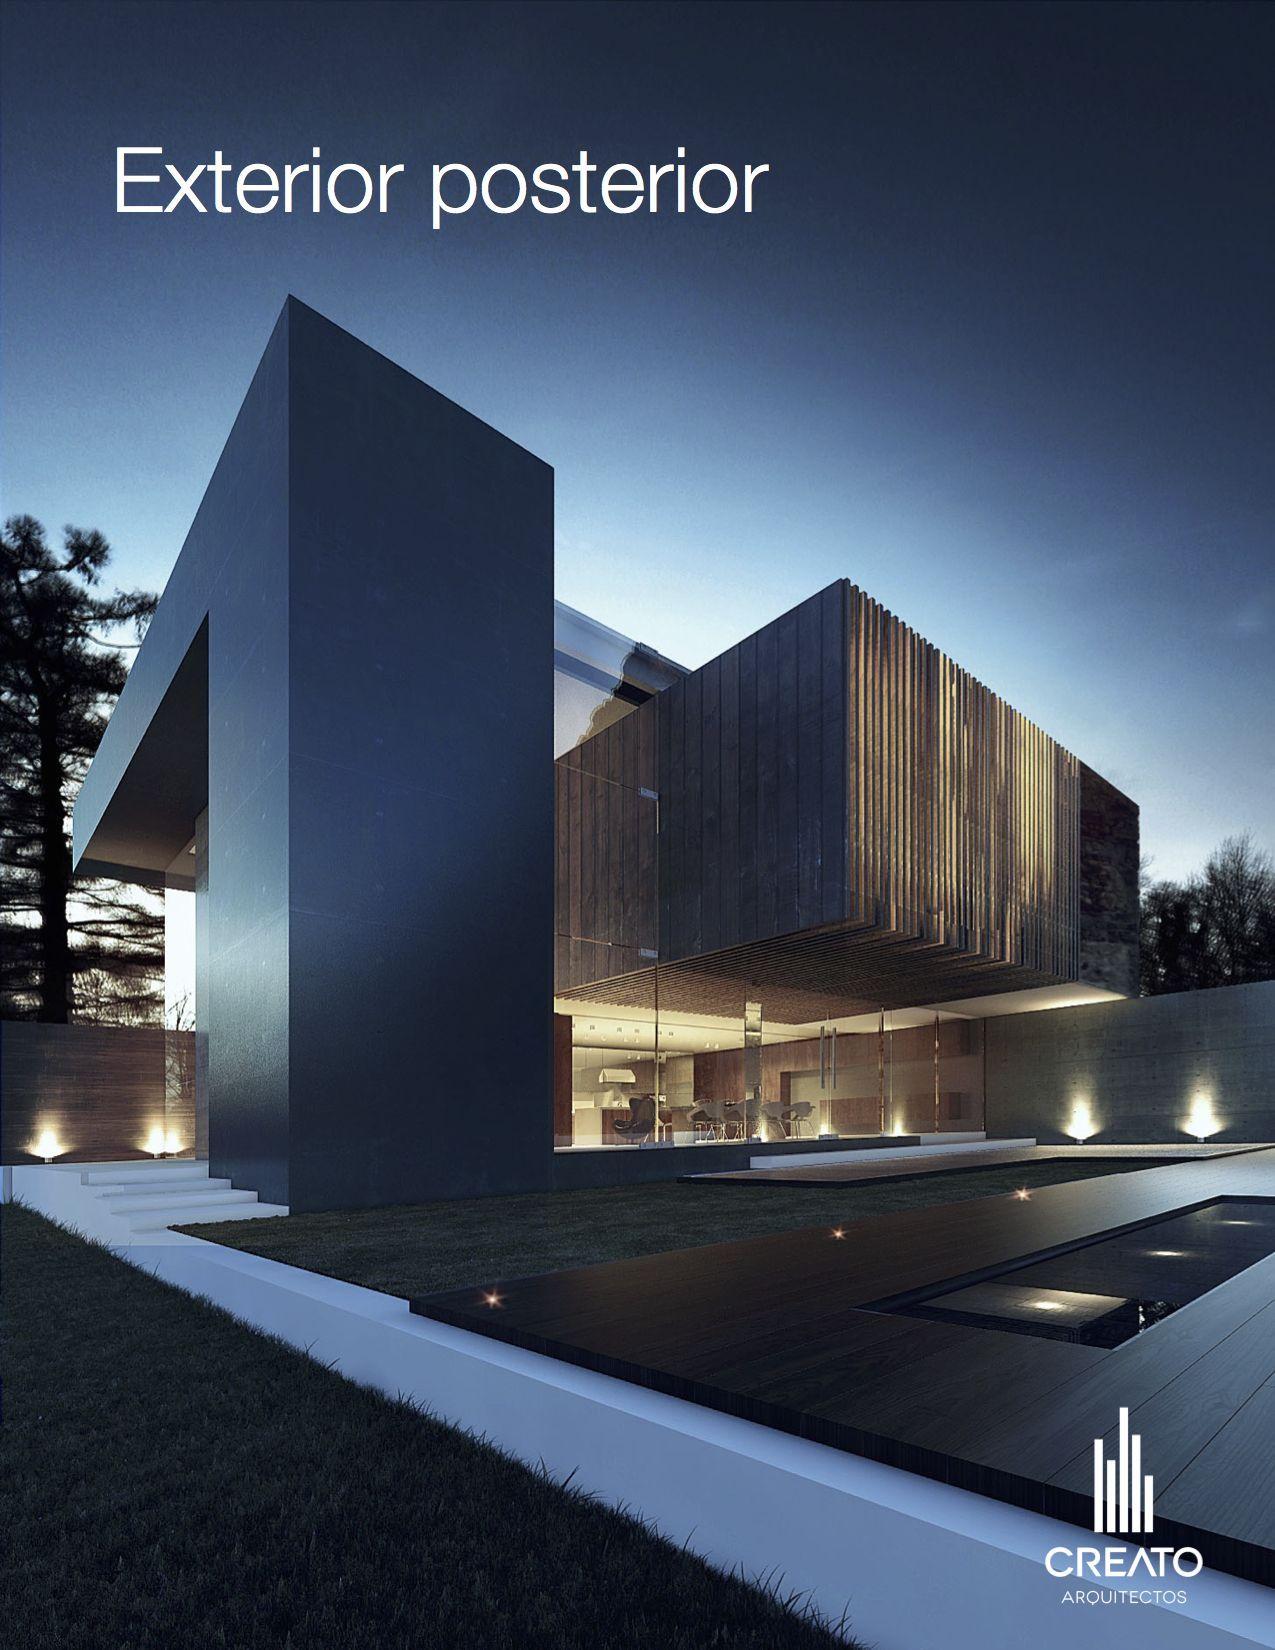 Casas fachada volumen creato arquitectos for Casa minimalista vidrio